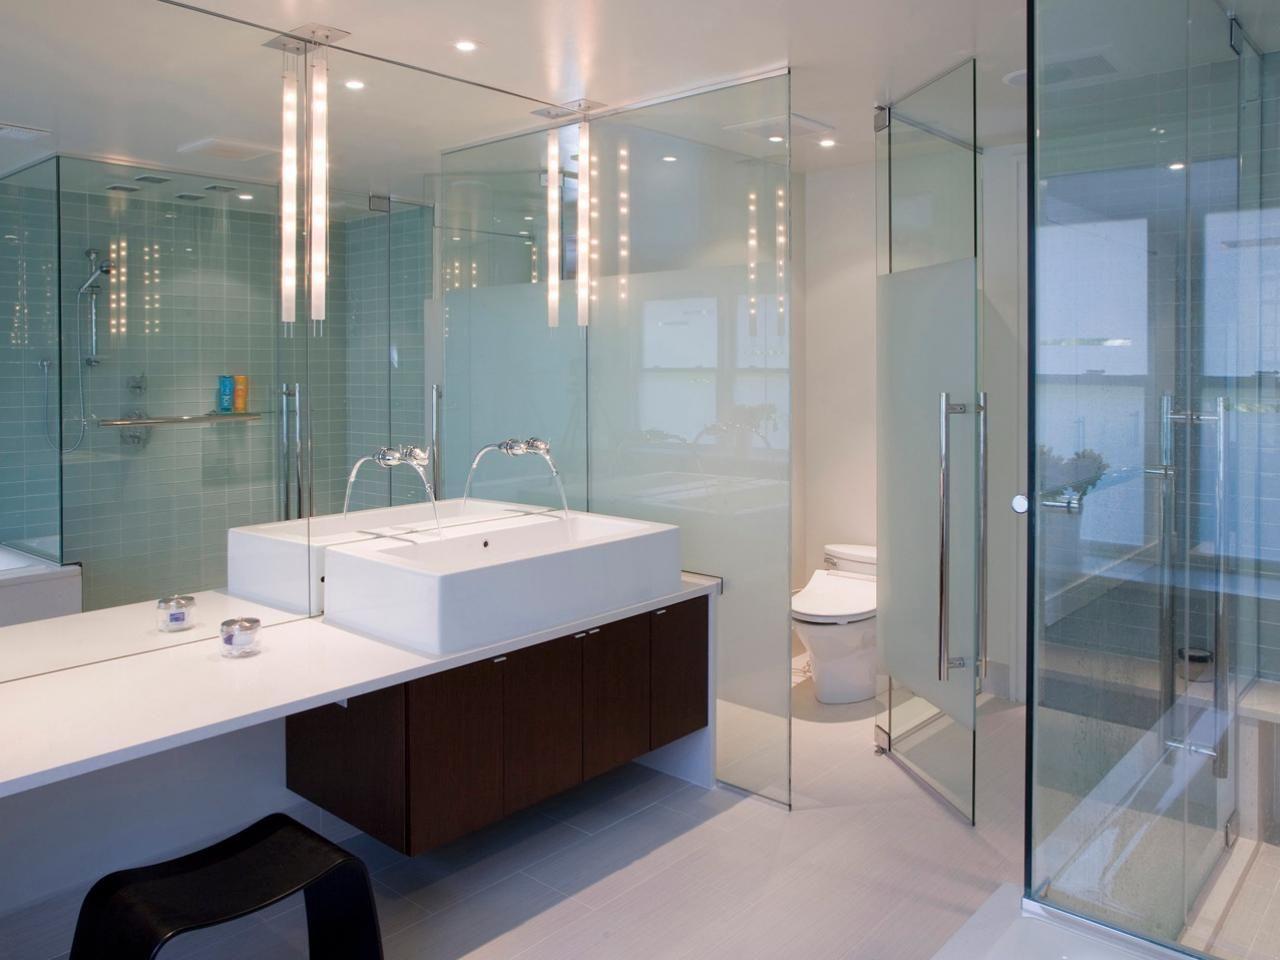 The Awesome Web Choosing a Bathroom Layout